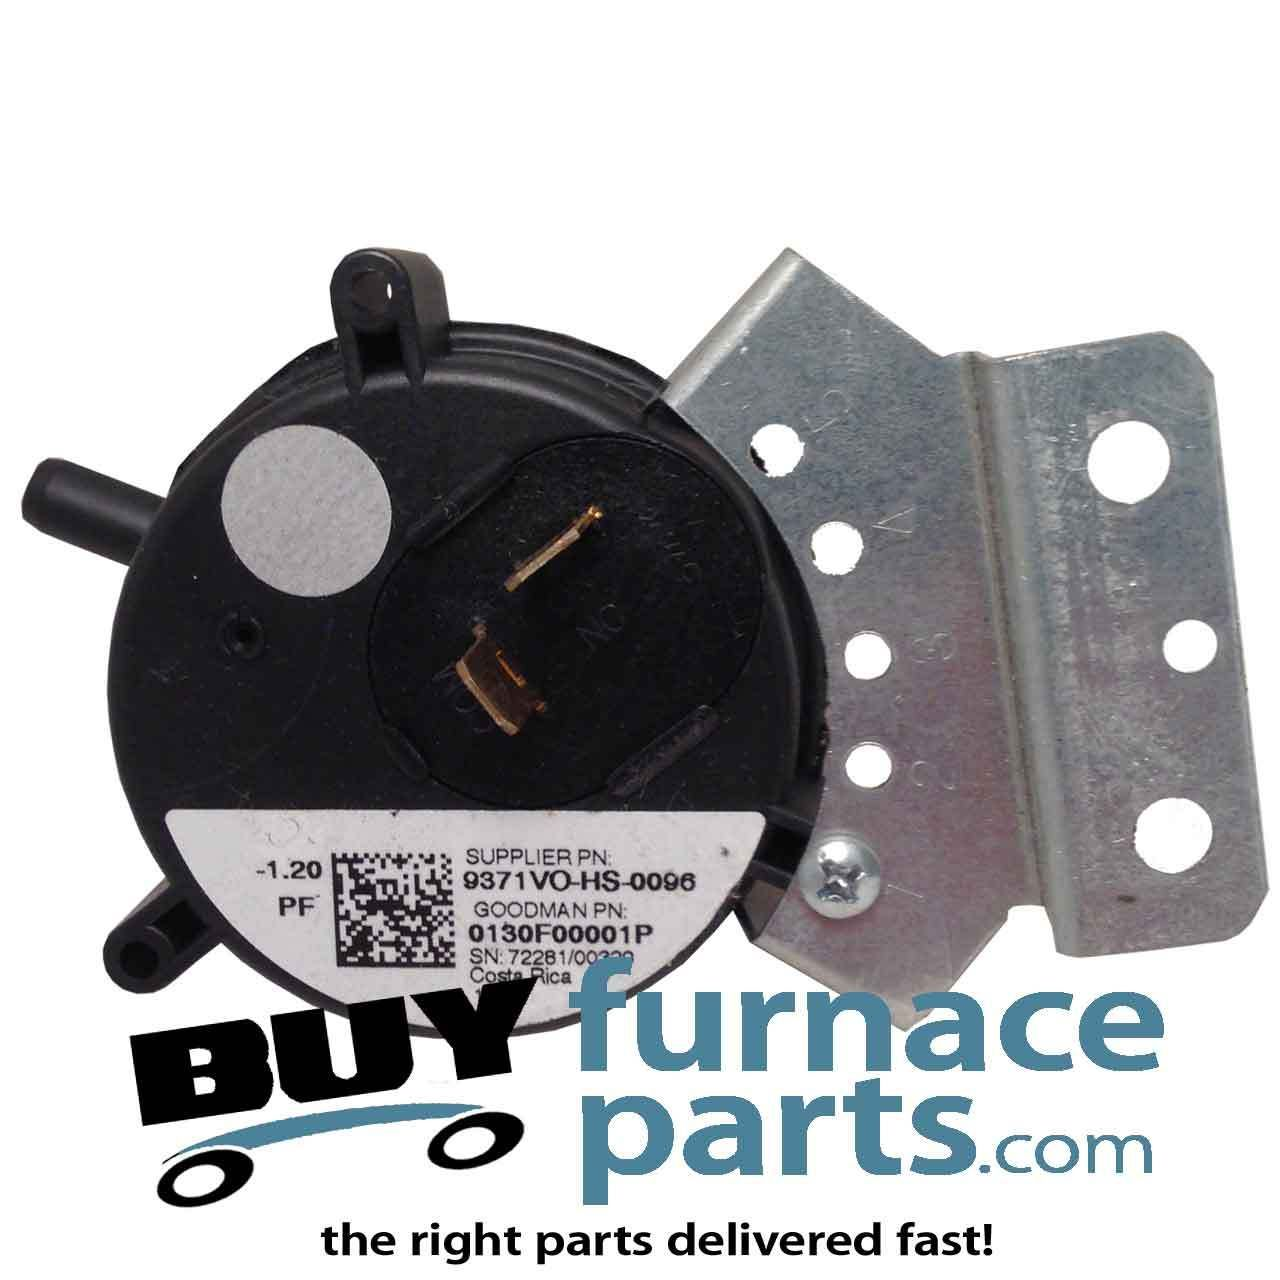 http www buyfurnaceparts com goodman furnace parts 0130f00001p rh pinterest com